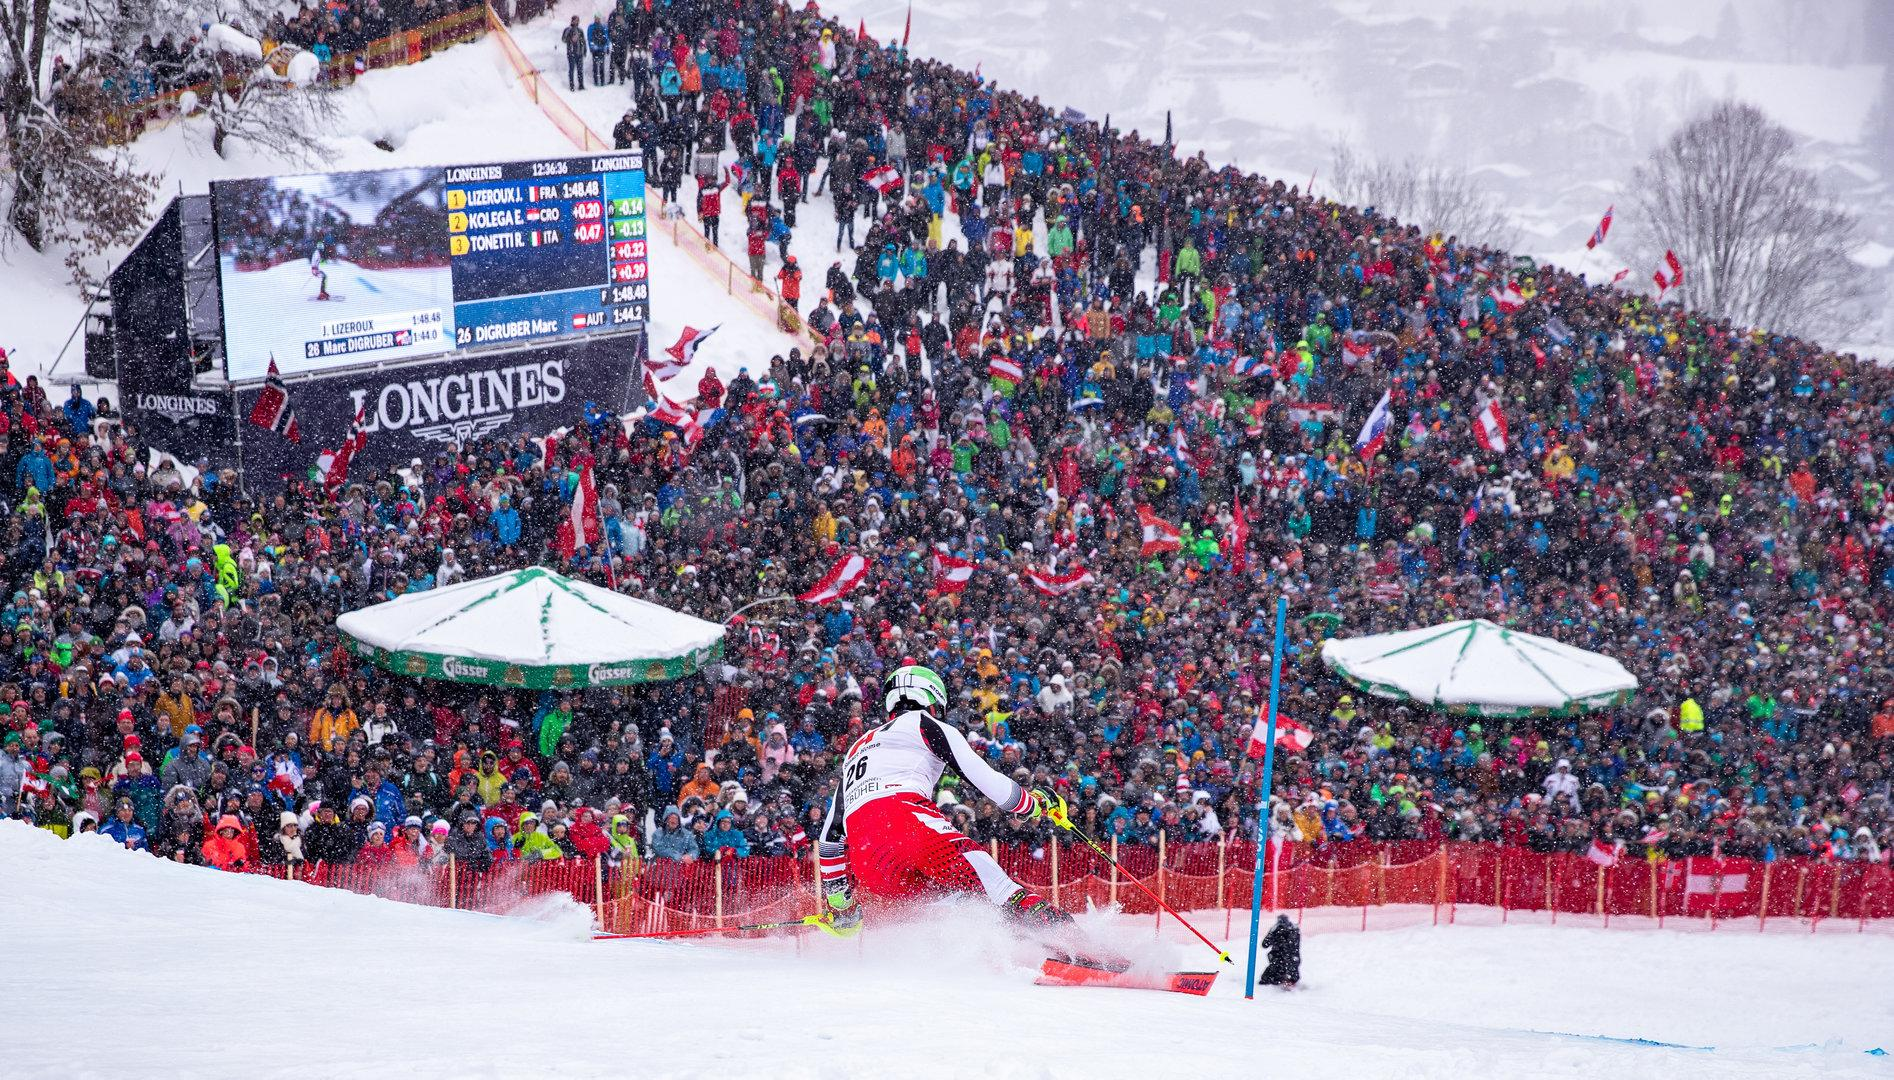 Live: Erster Durchgang beim Kitzbühel-Slalom